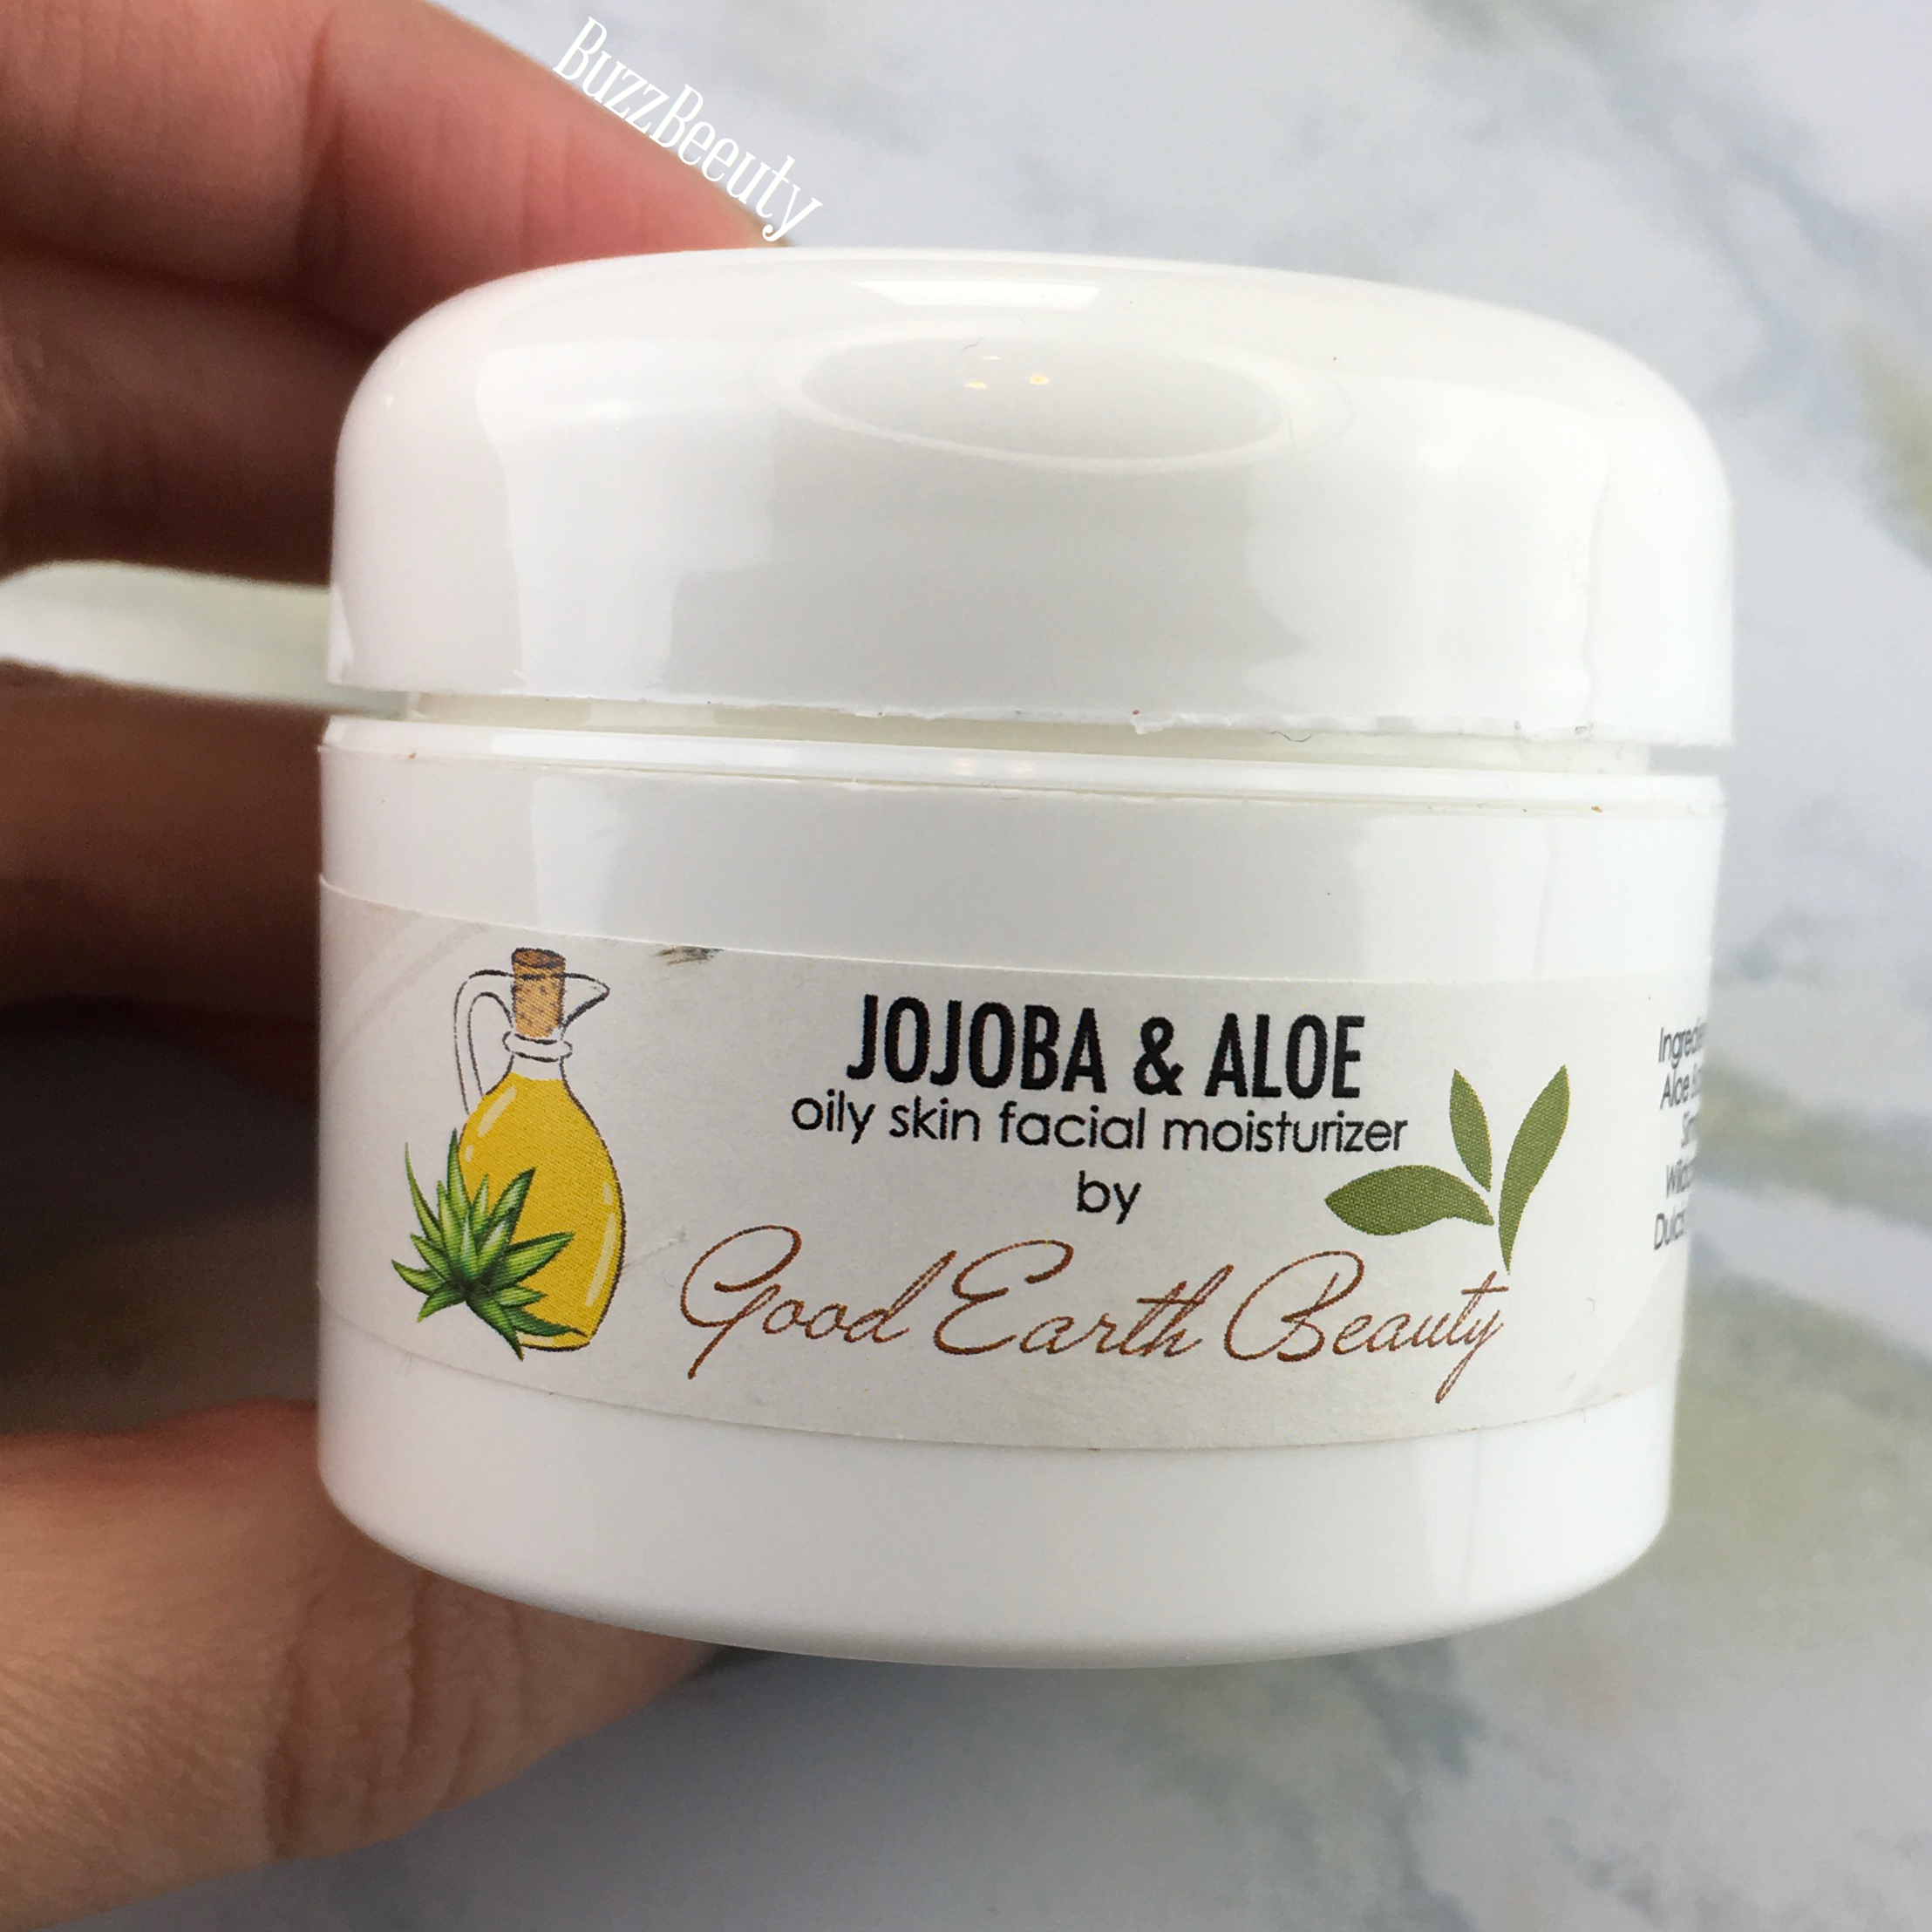 Good Earth Beauty Jojoba and Aloe Oily Skin Facial Moisturizer